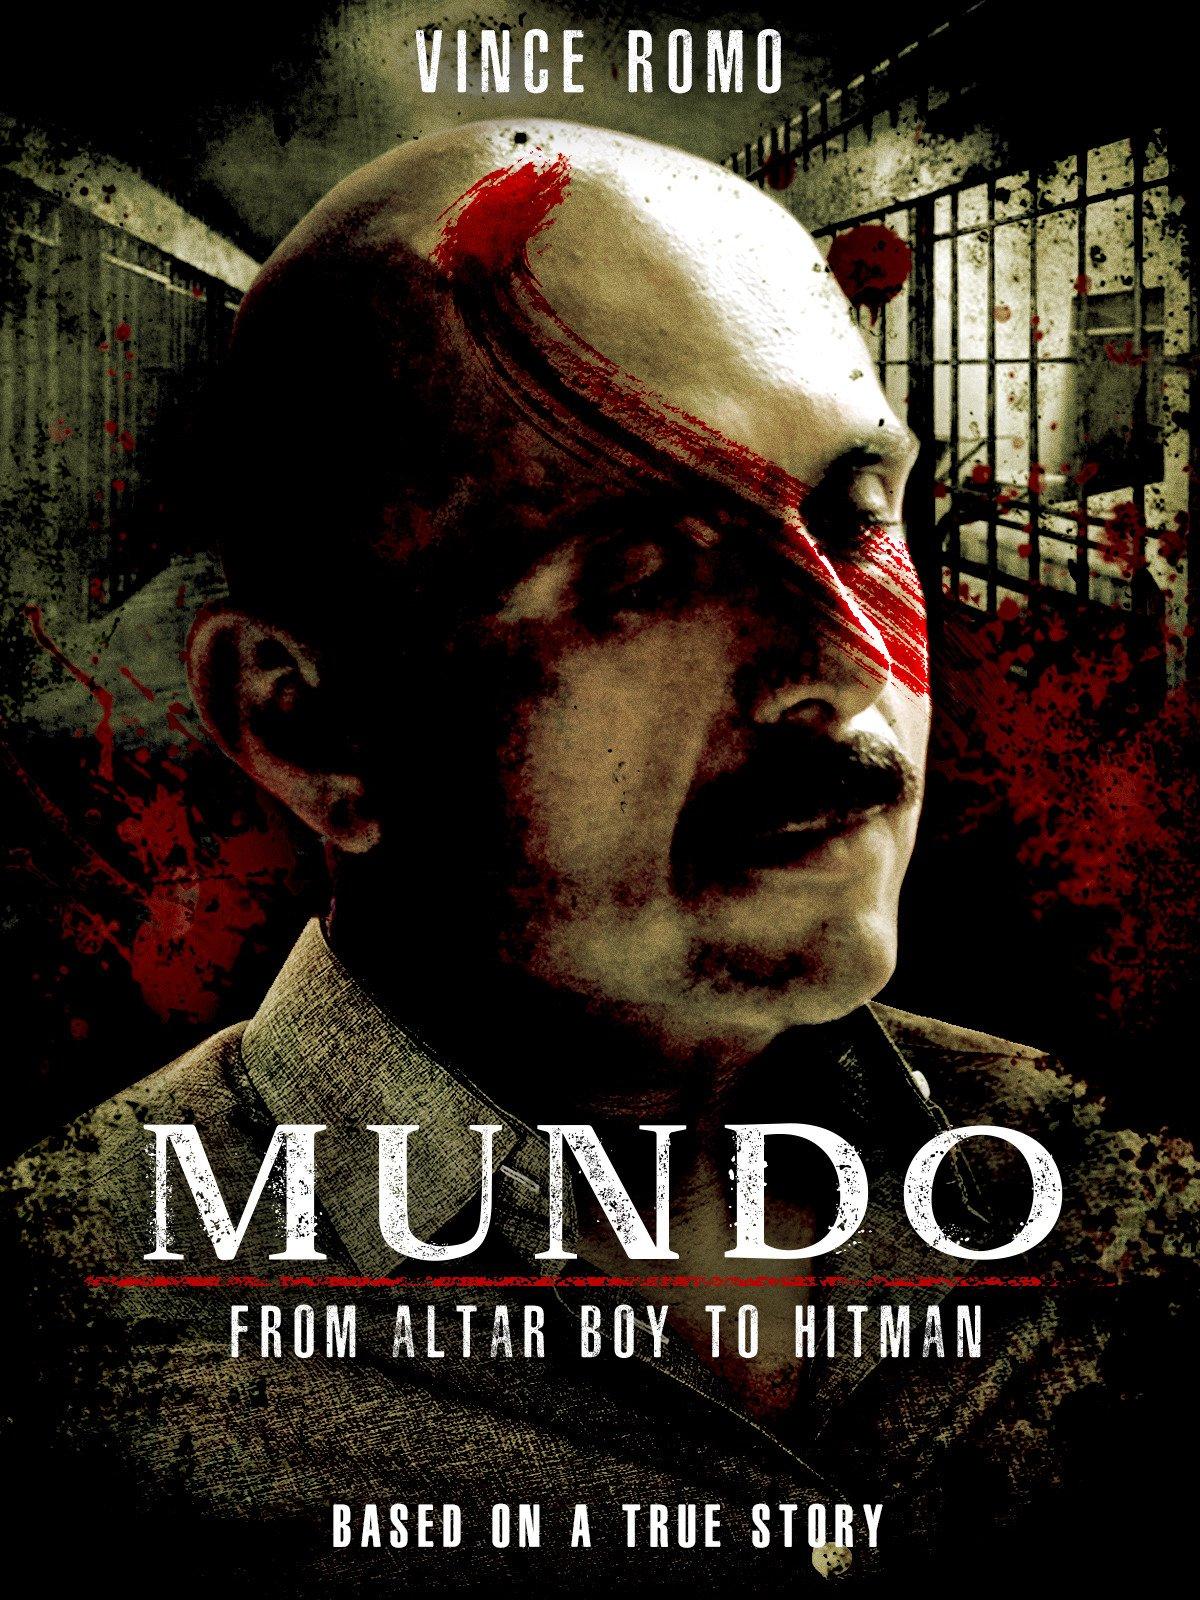 Watch Mundo From Altar Boy To Hitman On Amazon Prime Video Uk